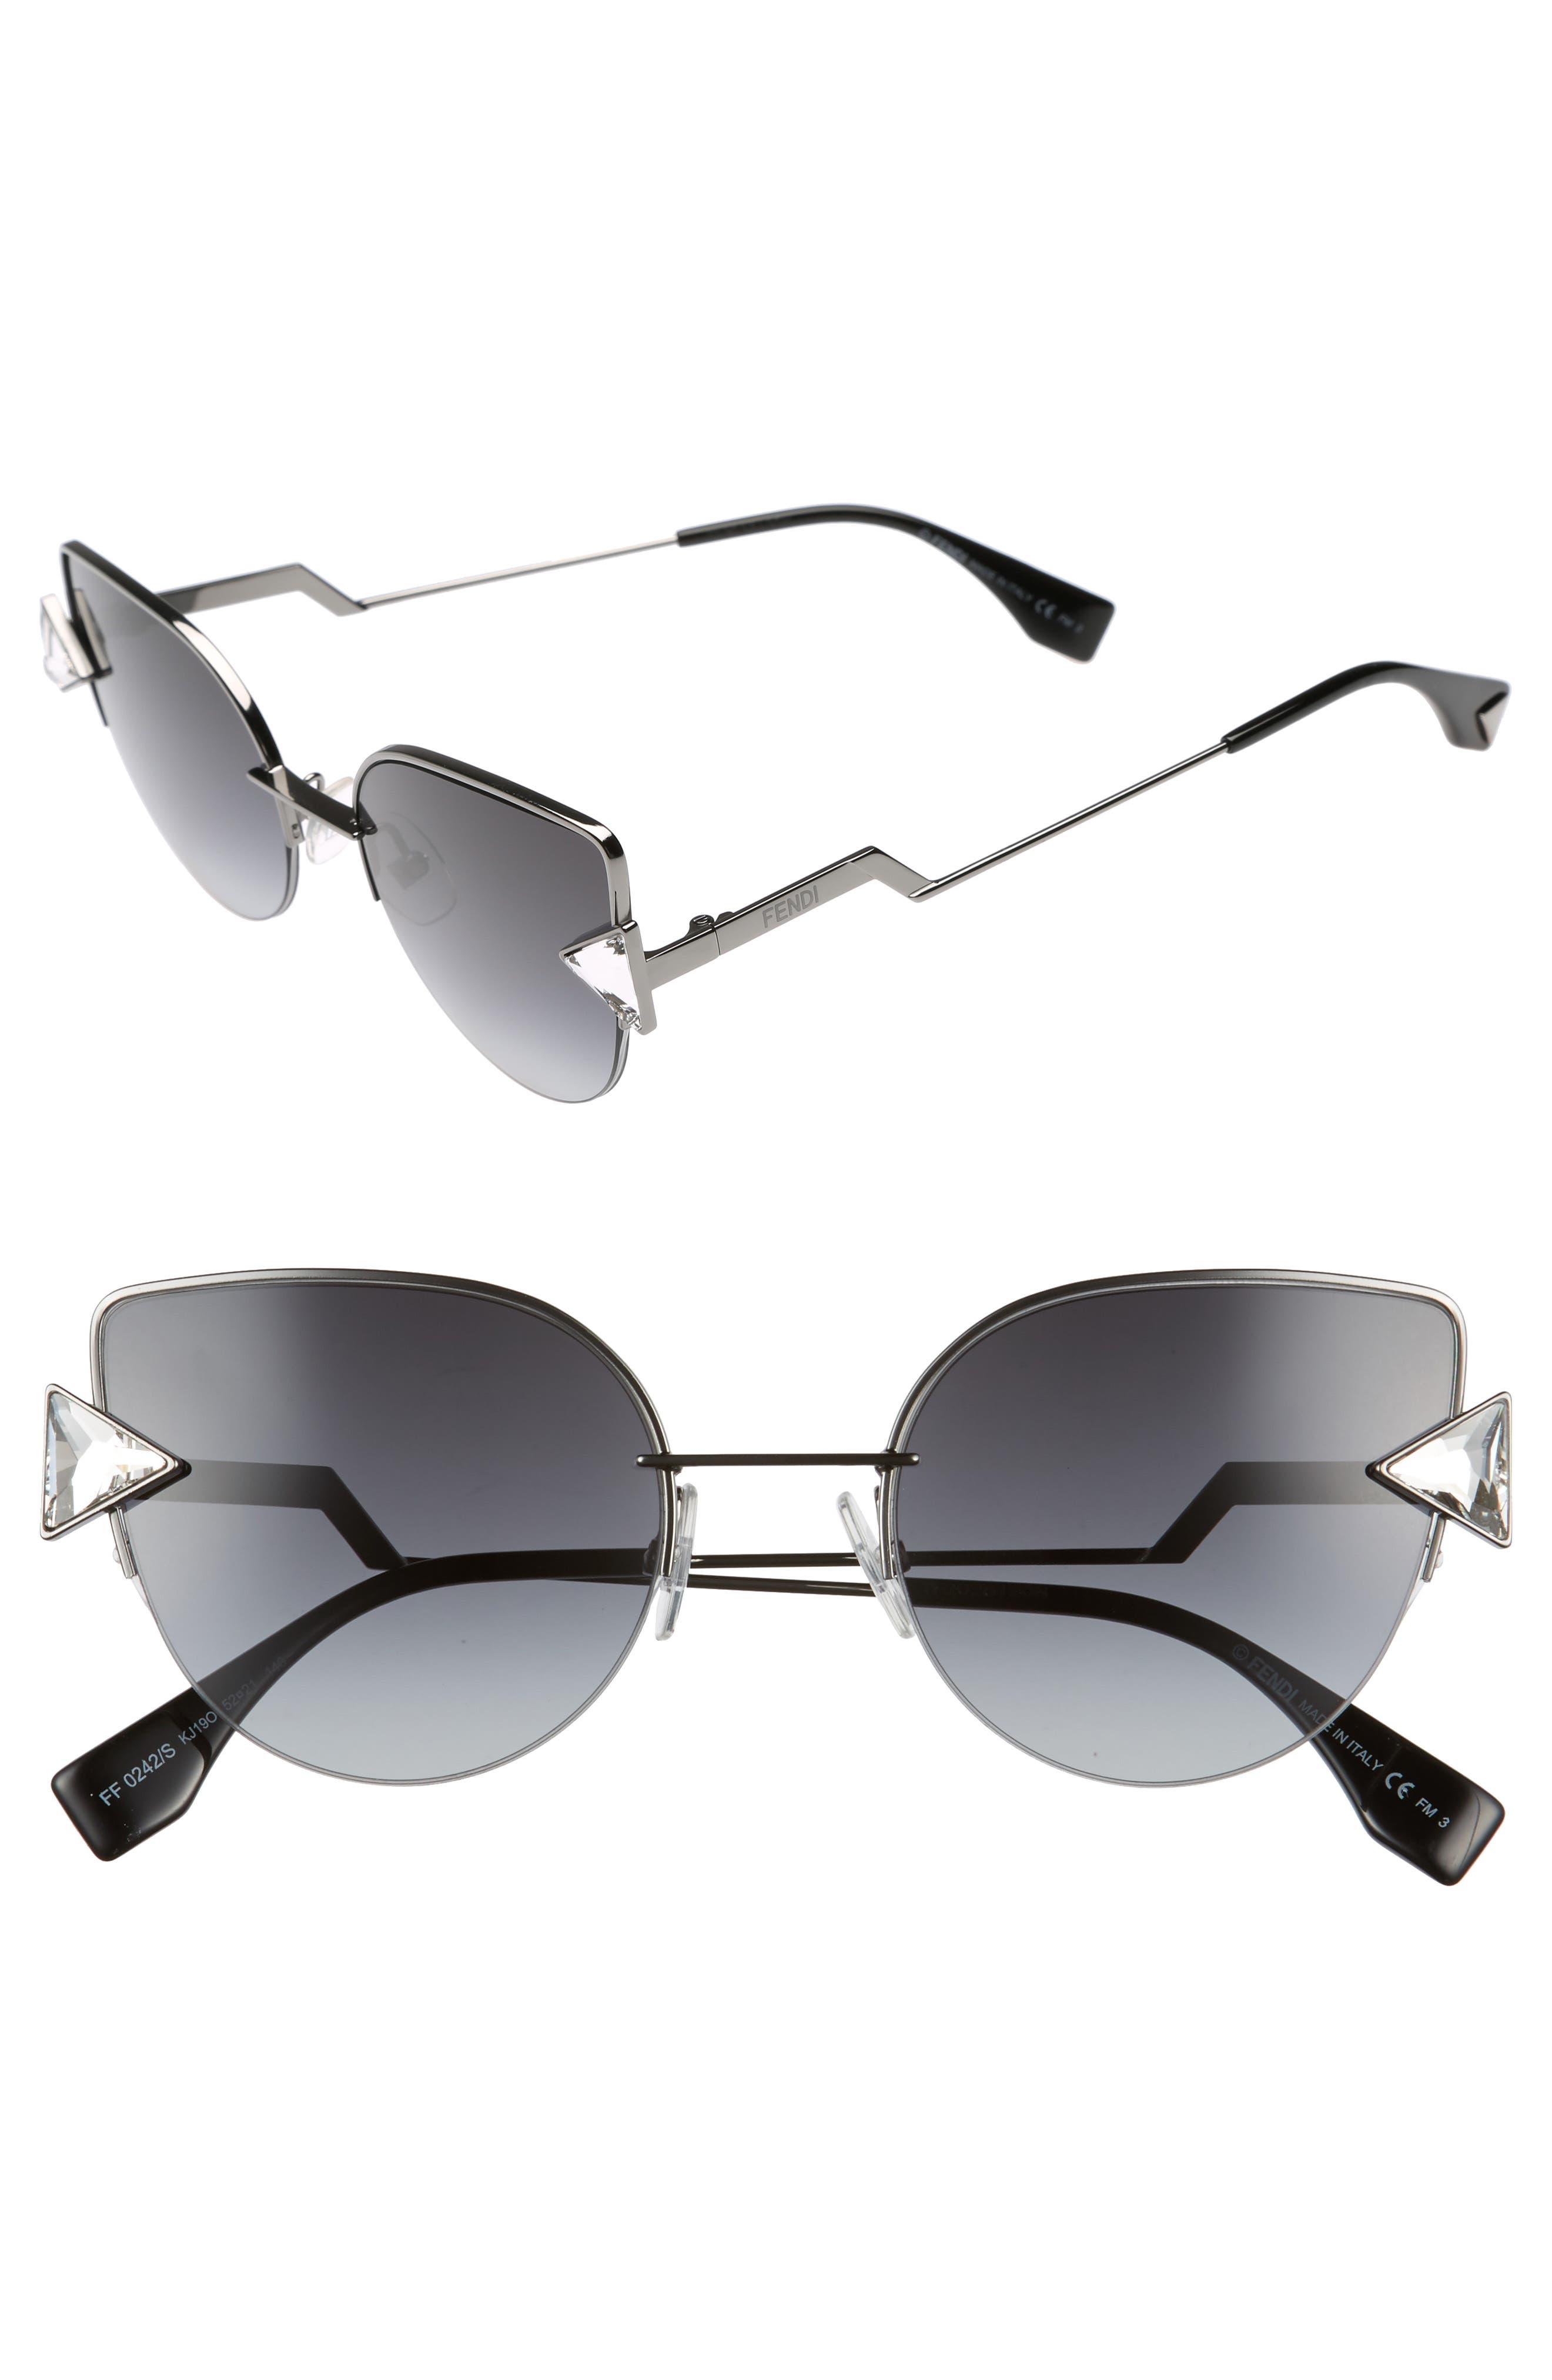 Rainbow 52mm Semi-Rimless Sunglasses,                         Main,                         color, 040